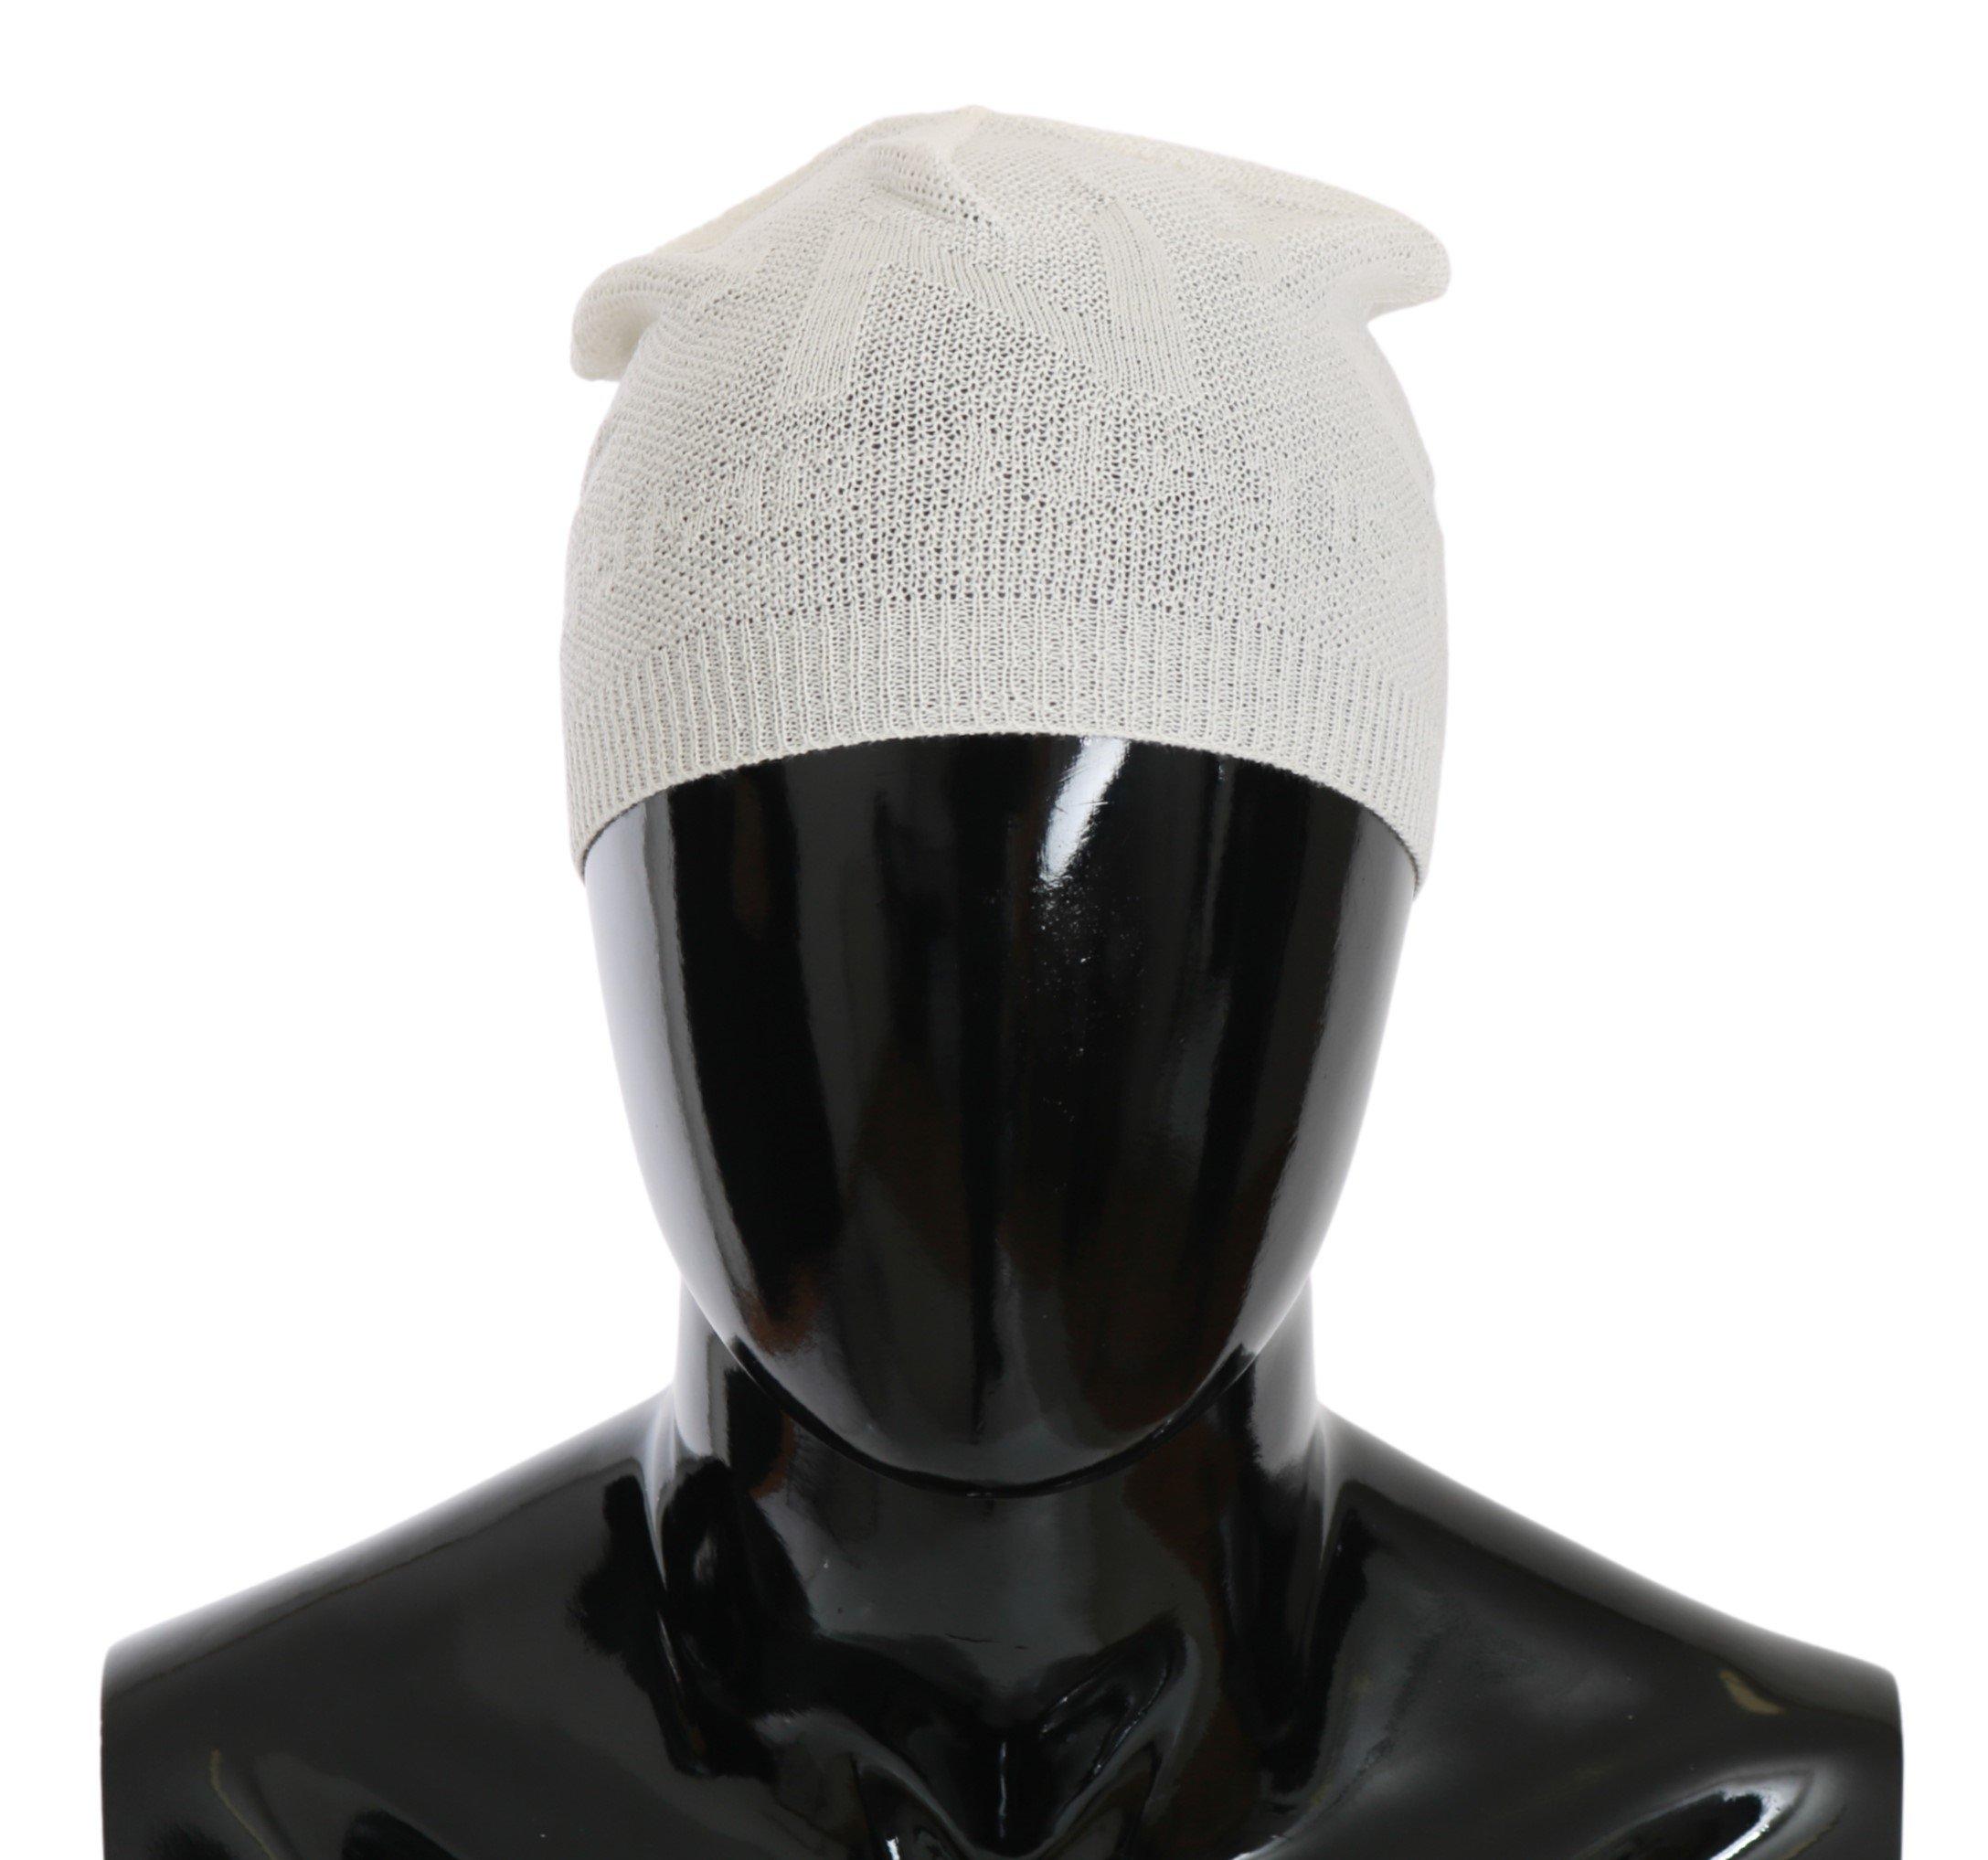 Dolce & Gabbana Men's Wool Blend Branded Hat White HAT20127